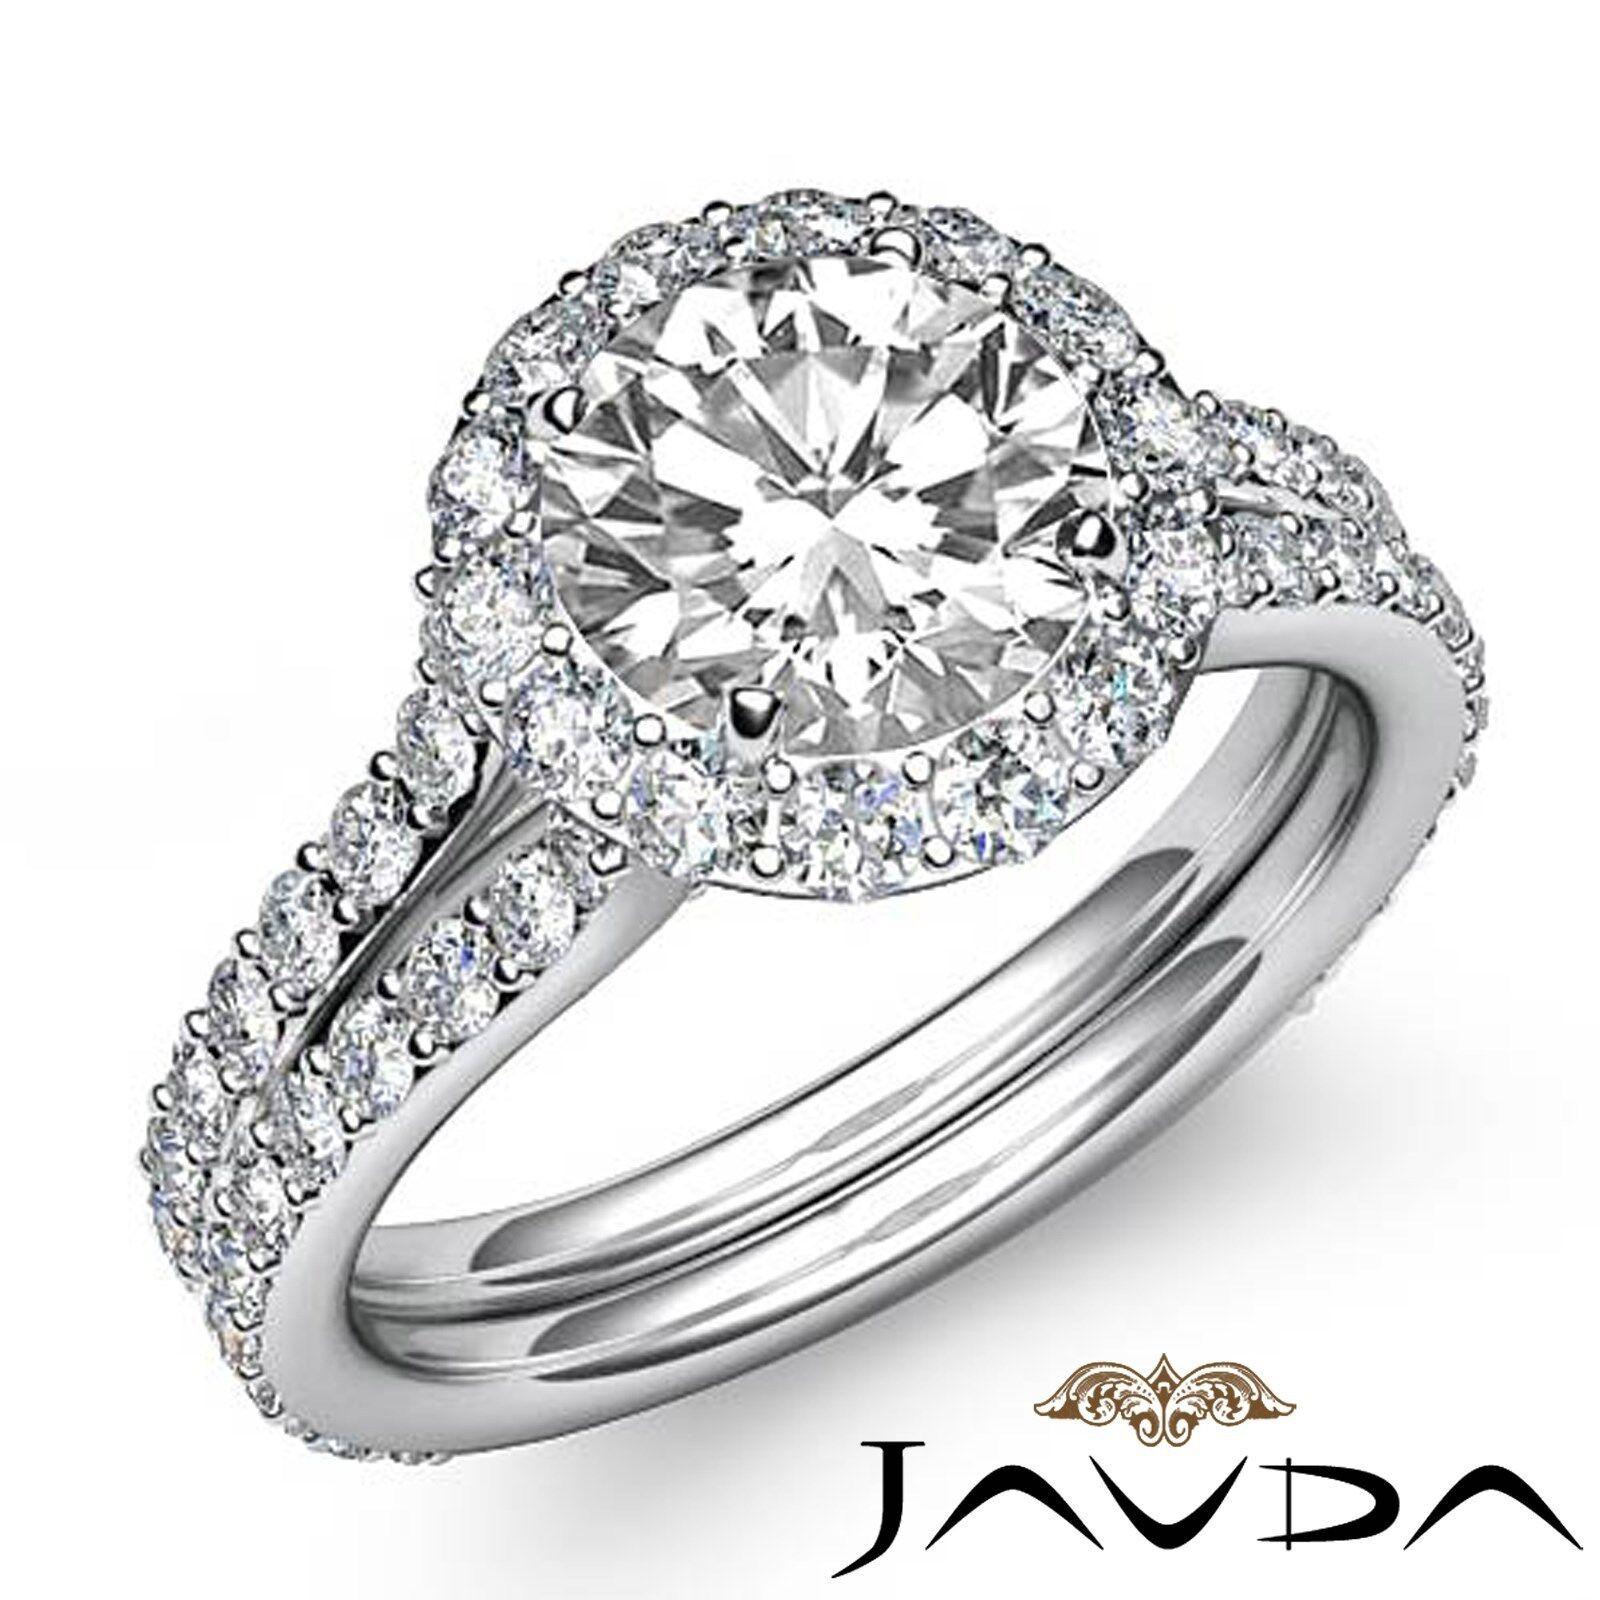 Halo Pave Set Round Diamond Split Shank Engagement Ring GIA I Color SI1 2.8 Ct